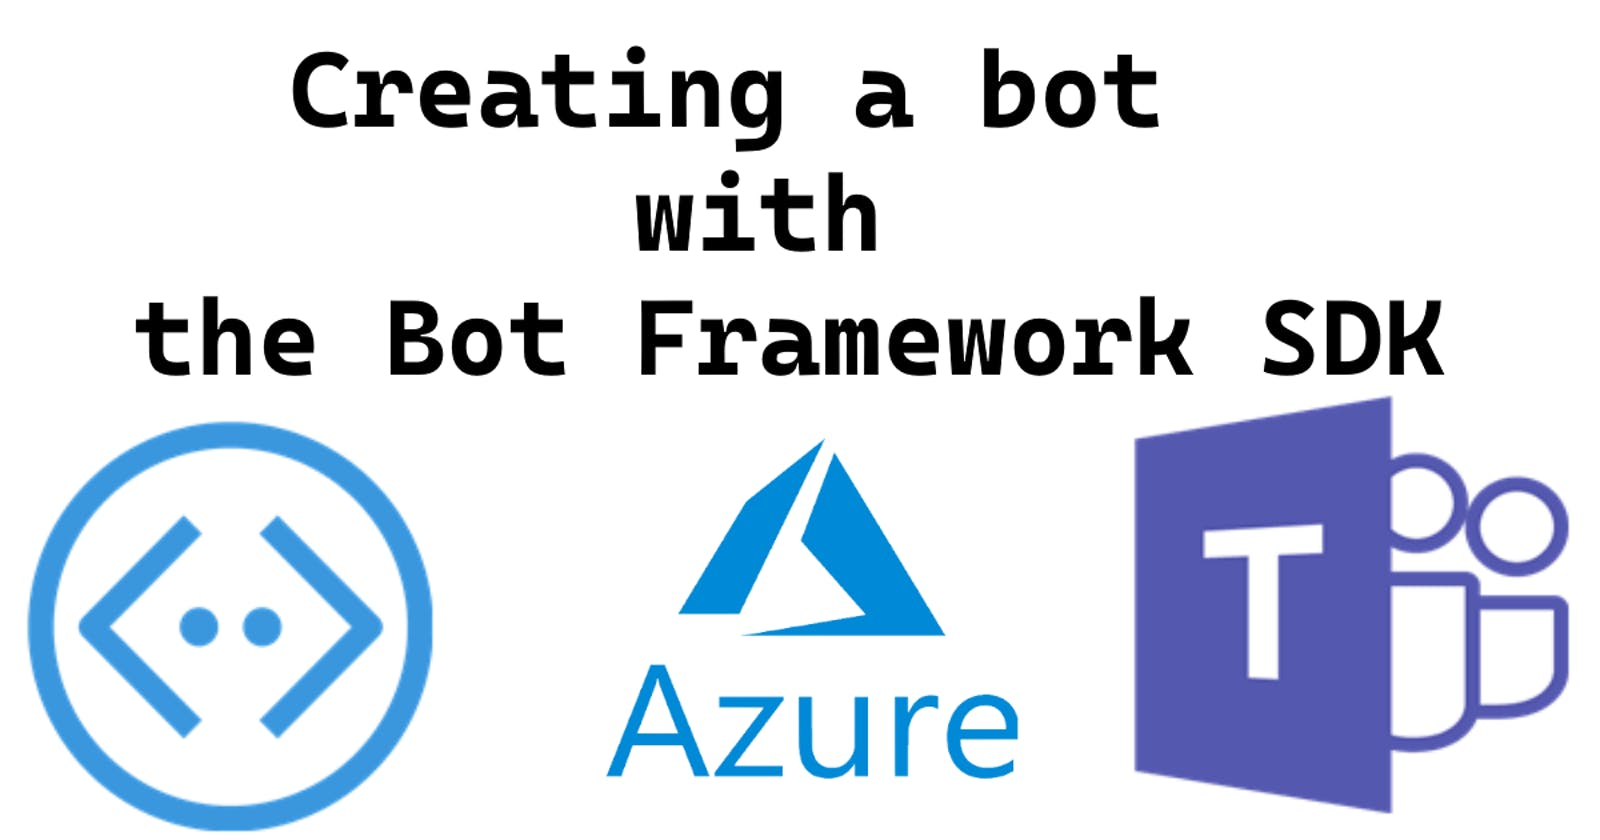 Creating a bot with the Bot Framework SDK